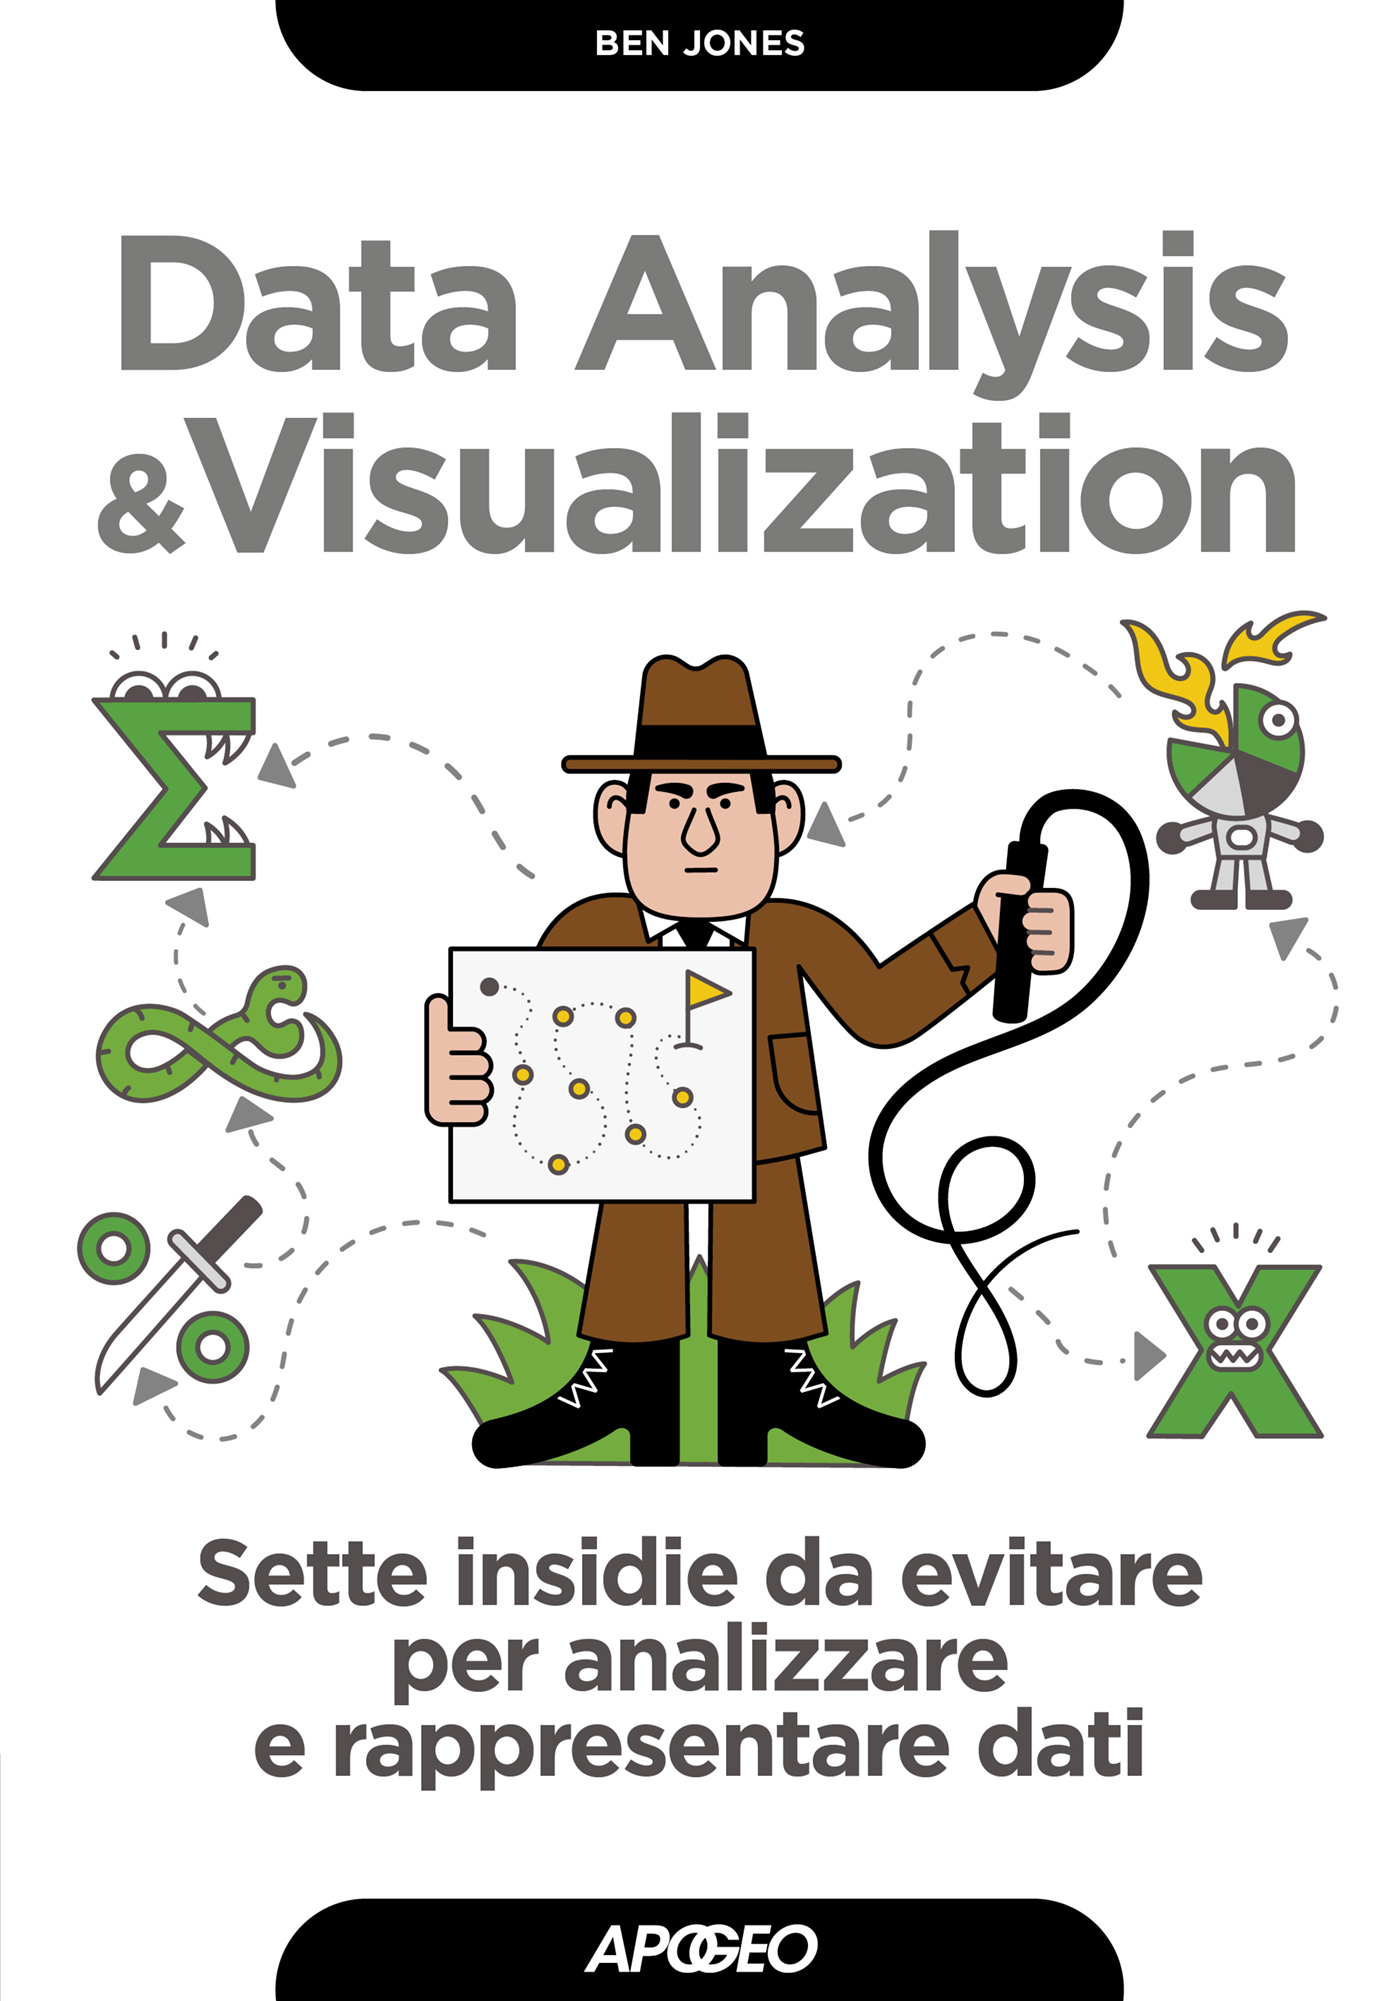 Data Analysis & Visualization, di Ben Jones